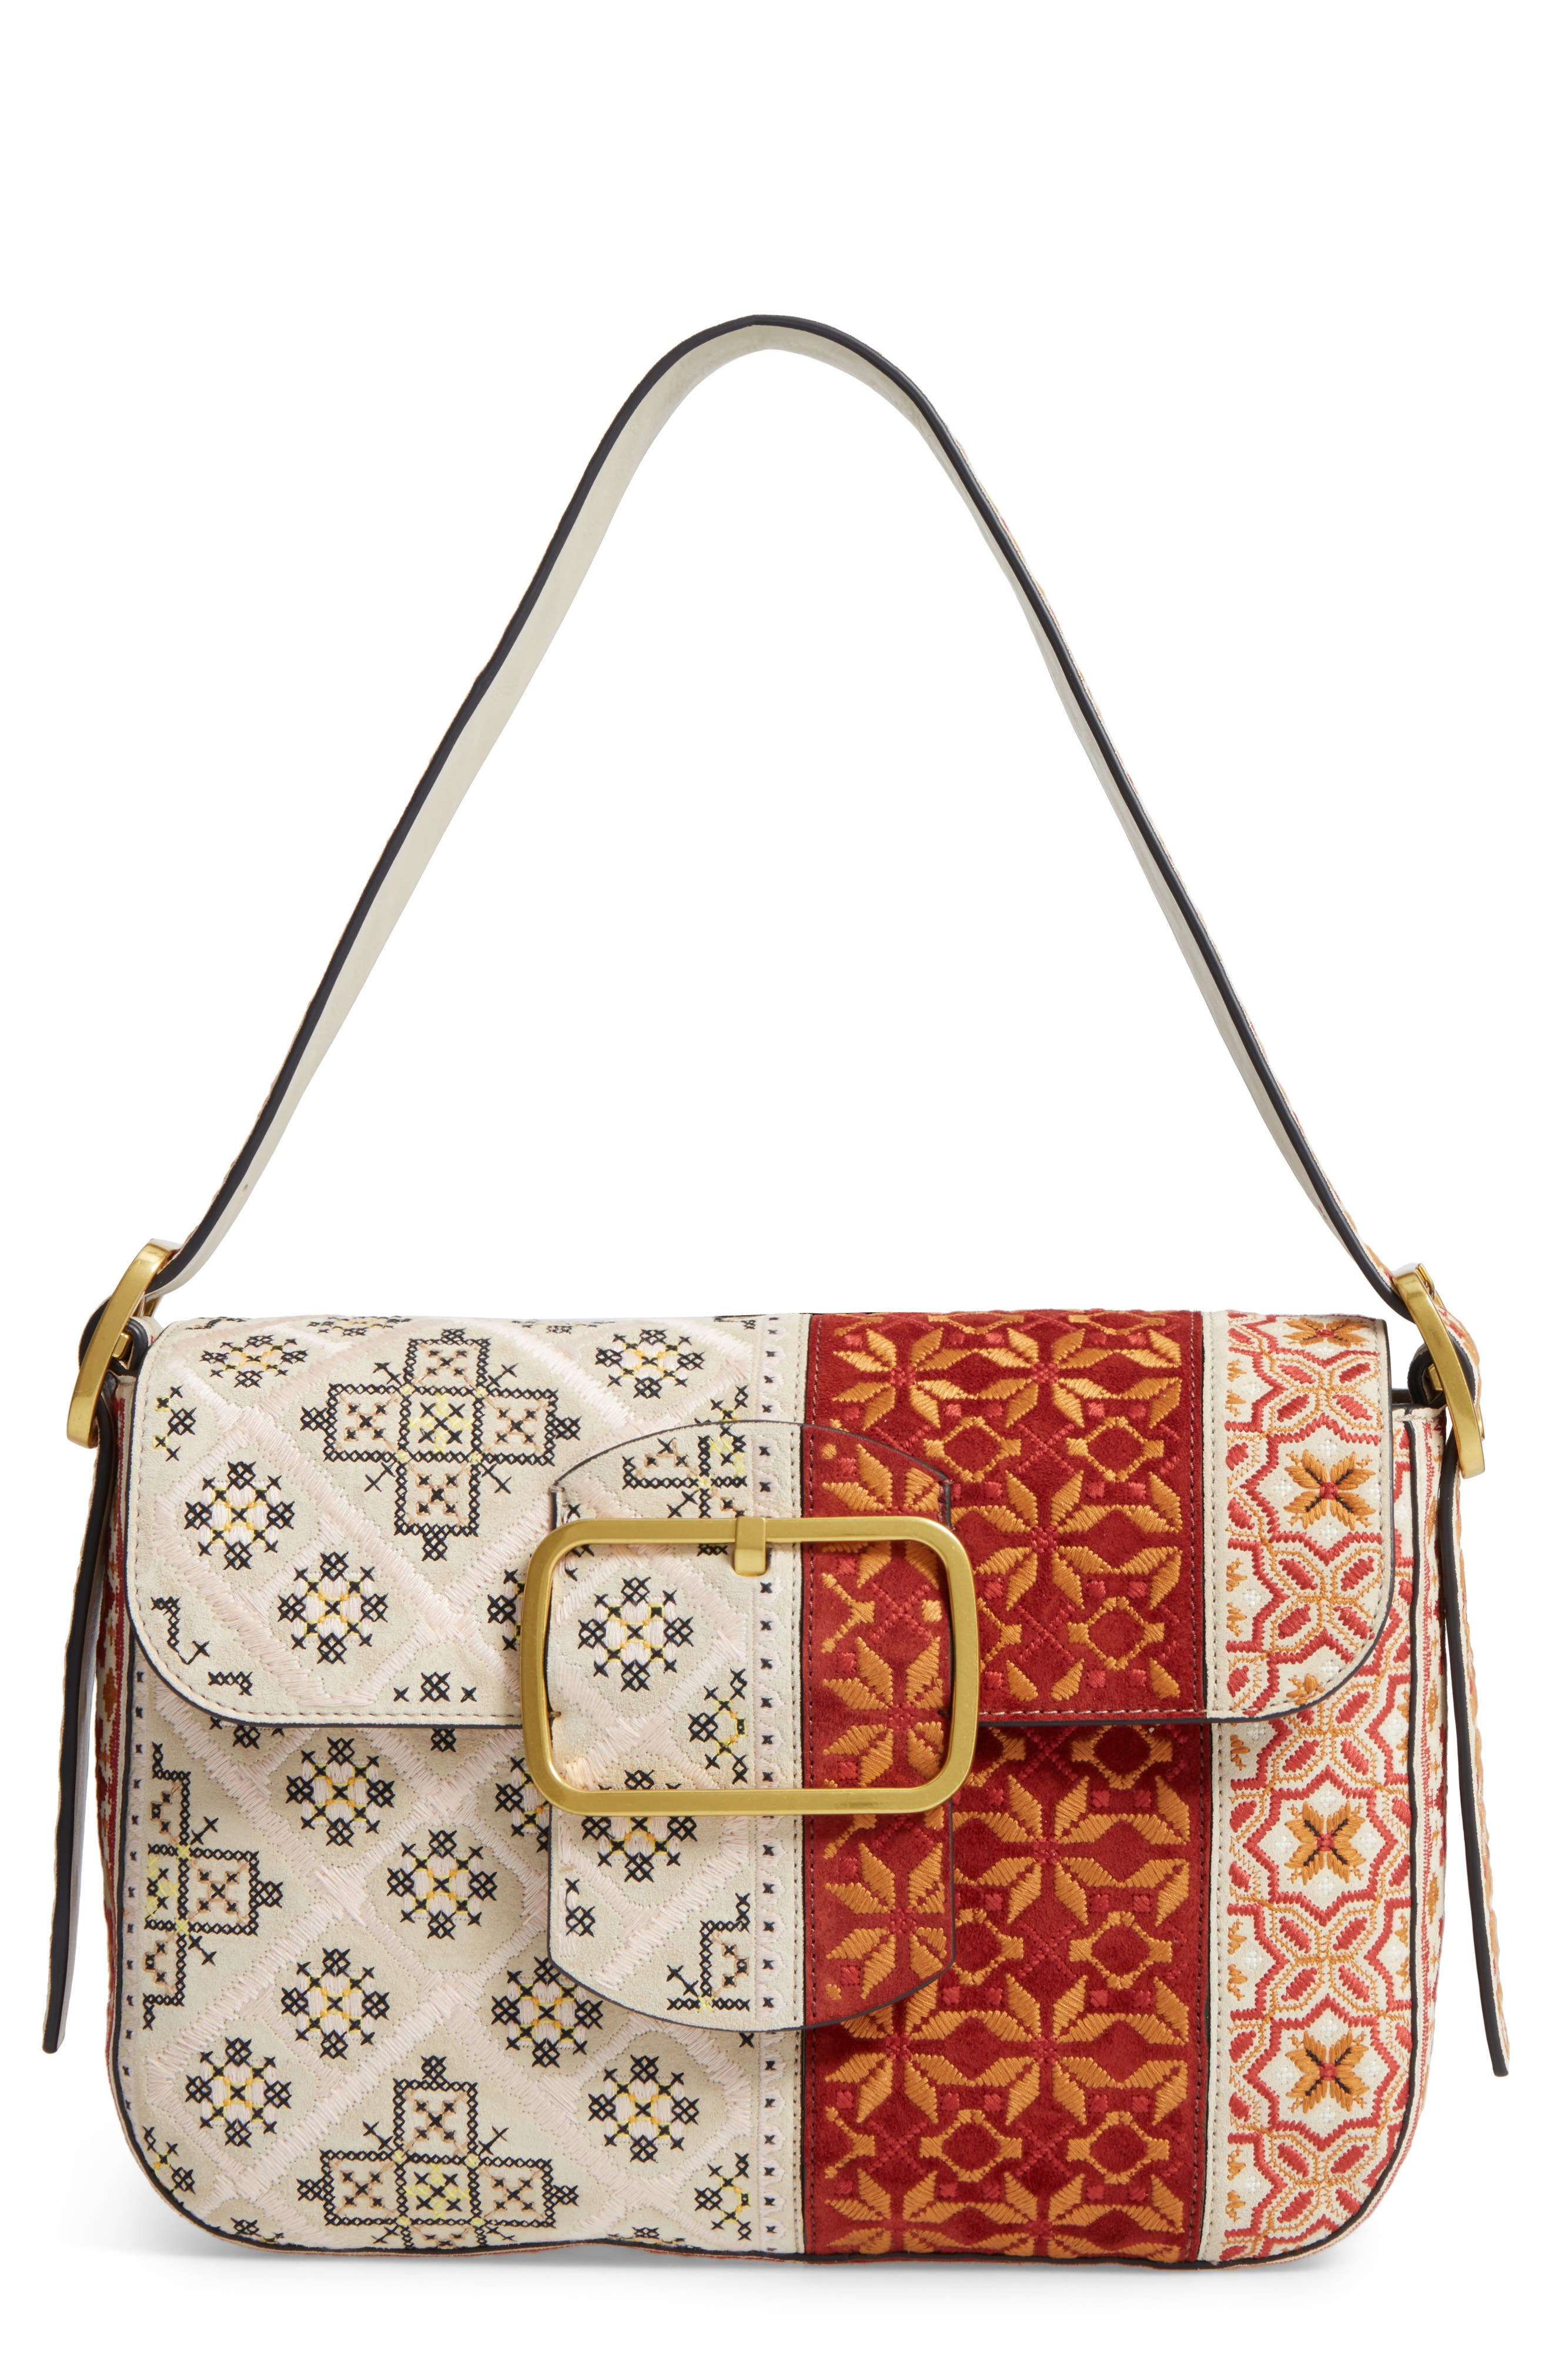 Tory Burch Sawyer Embroidered Shoulder Bag